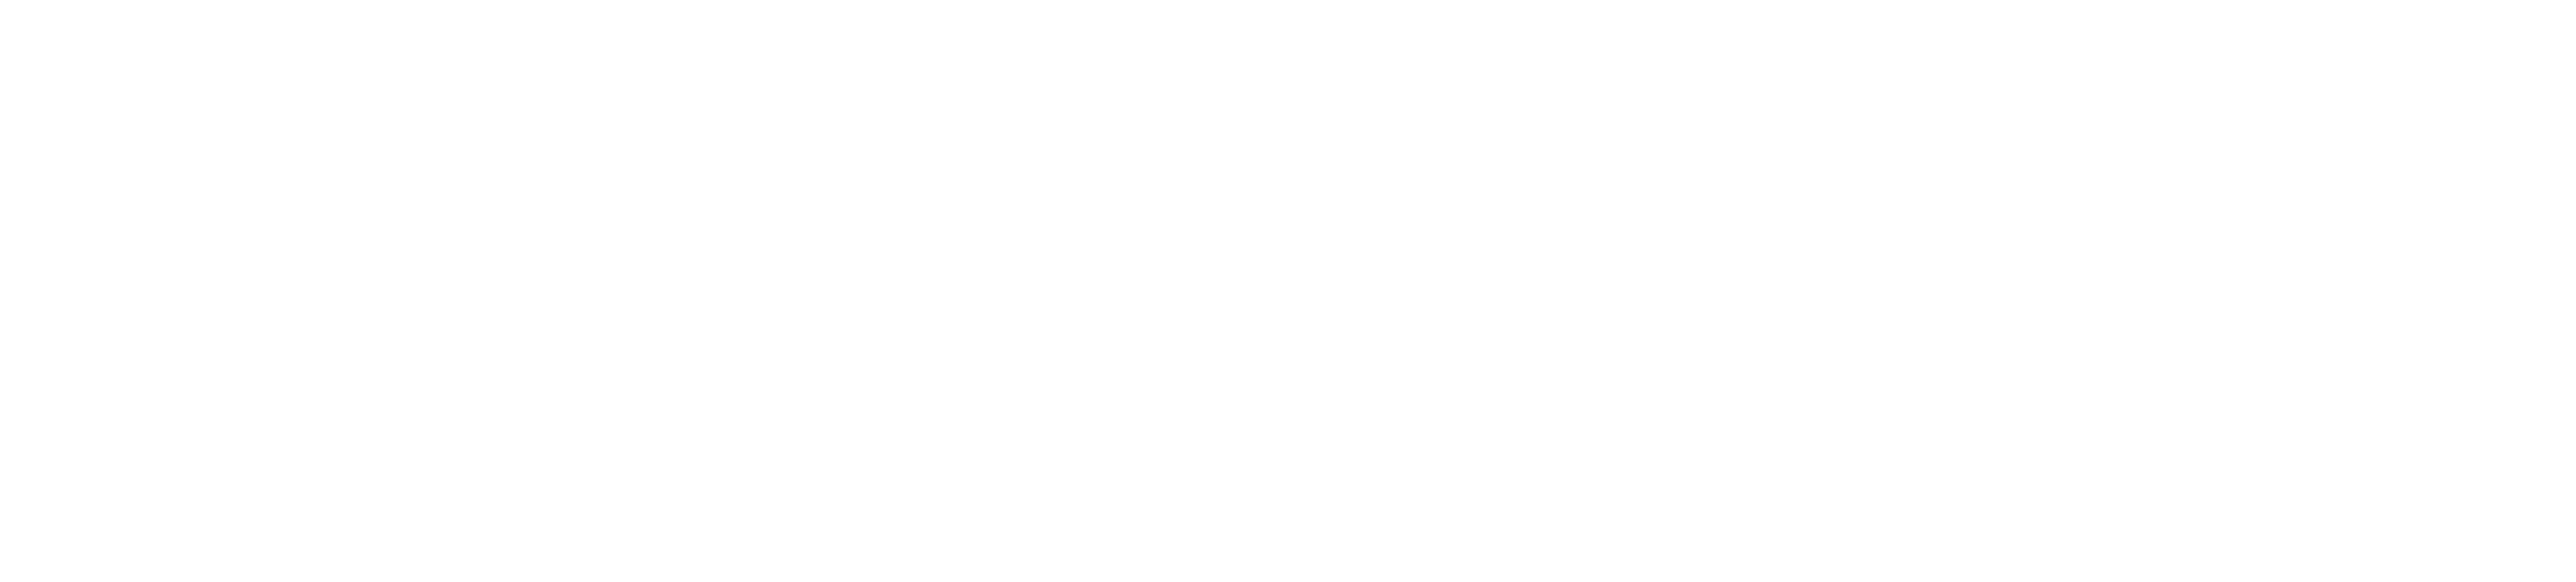 Petricore Games